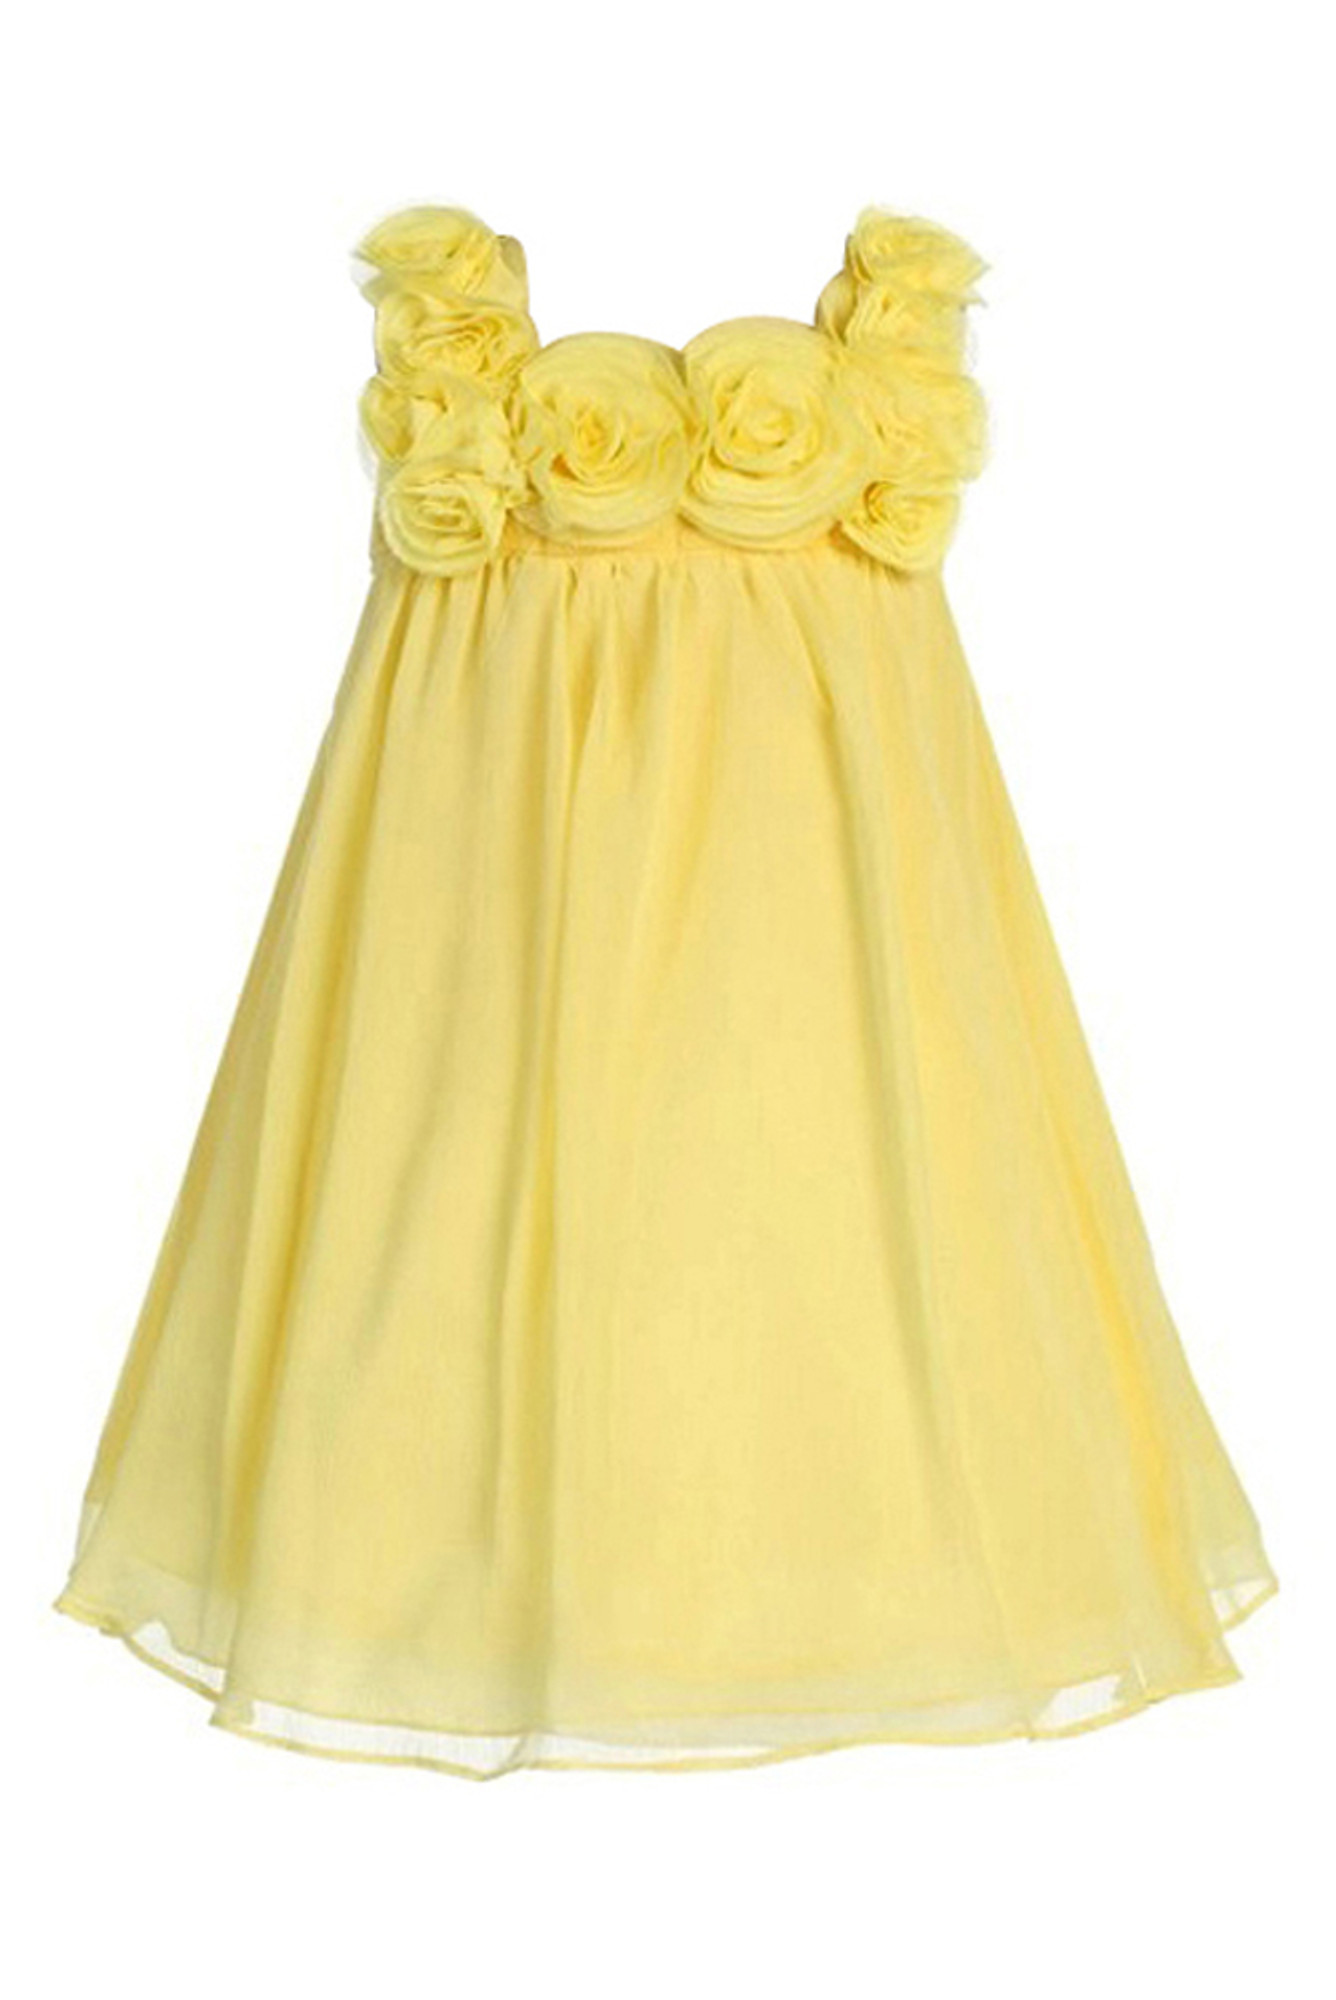 BIMARO Mädchen Kleid Leni gelb Festkleid edler Chiffon festlich ...